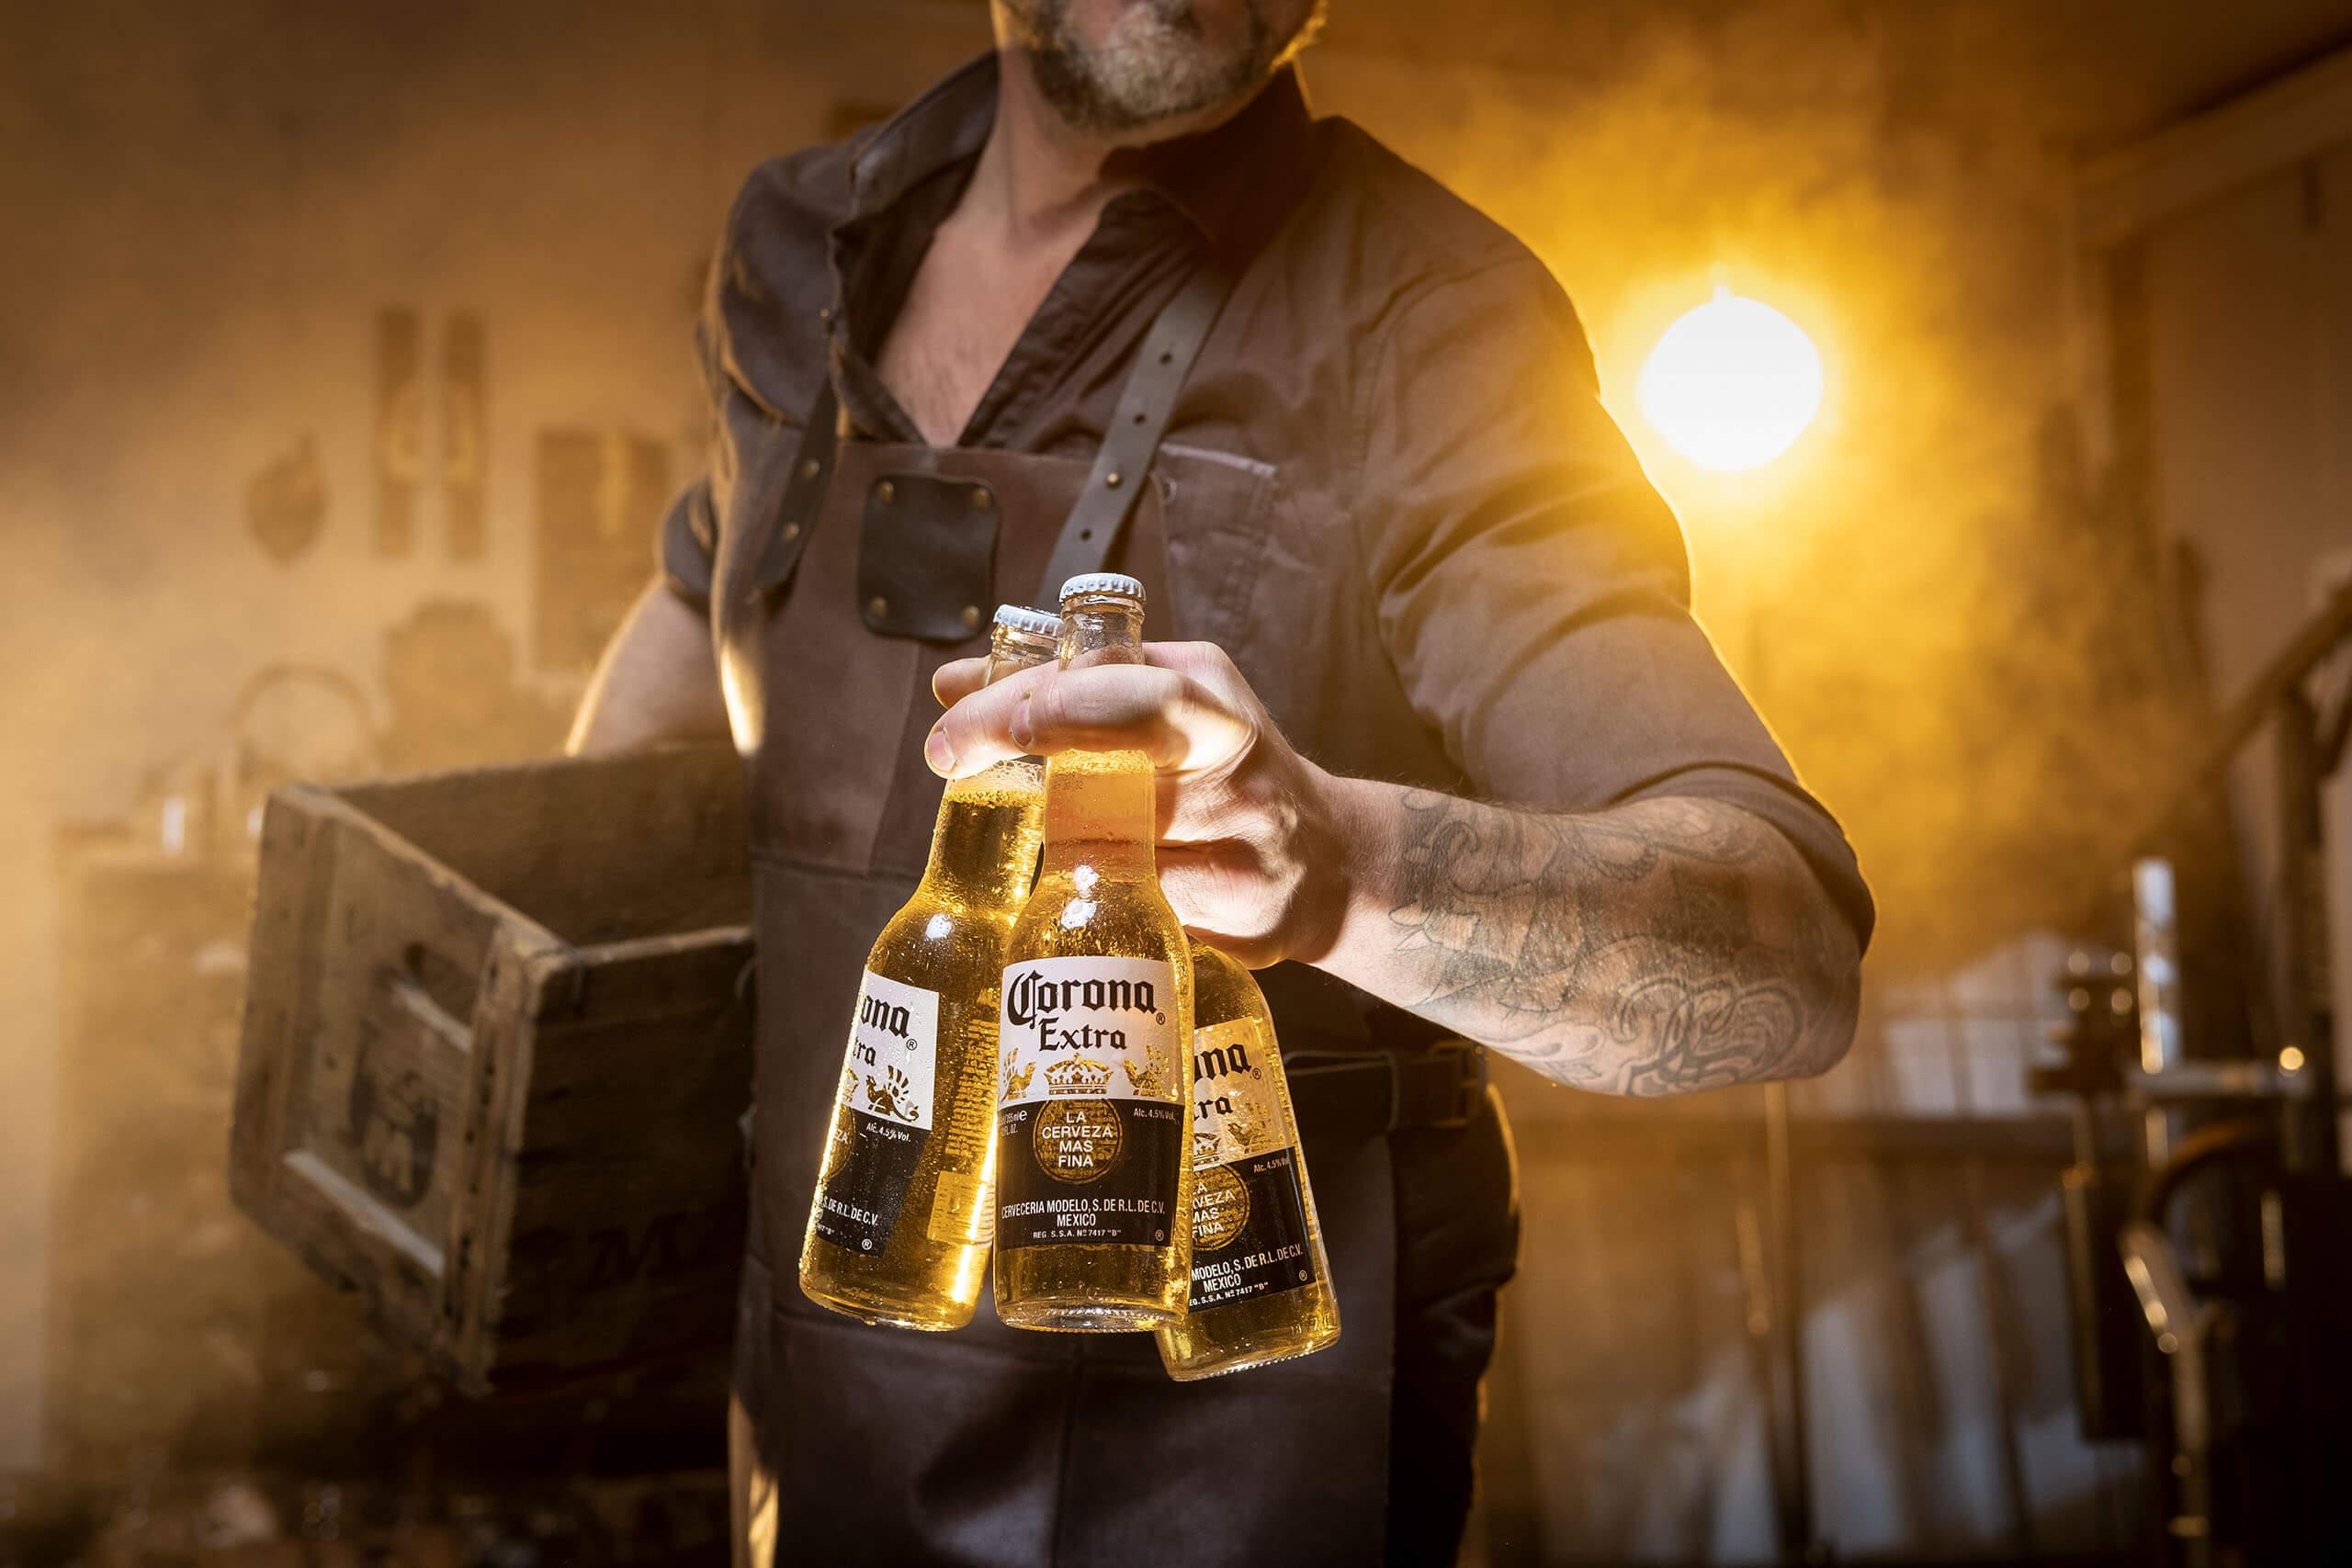 topfotograaf reclame merk campagne vormgever reclamebureau Corona identiteit